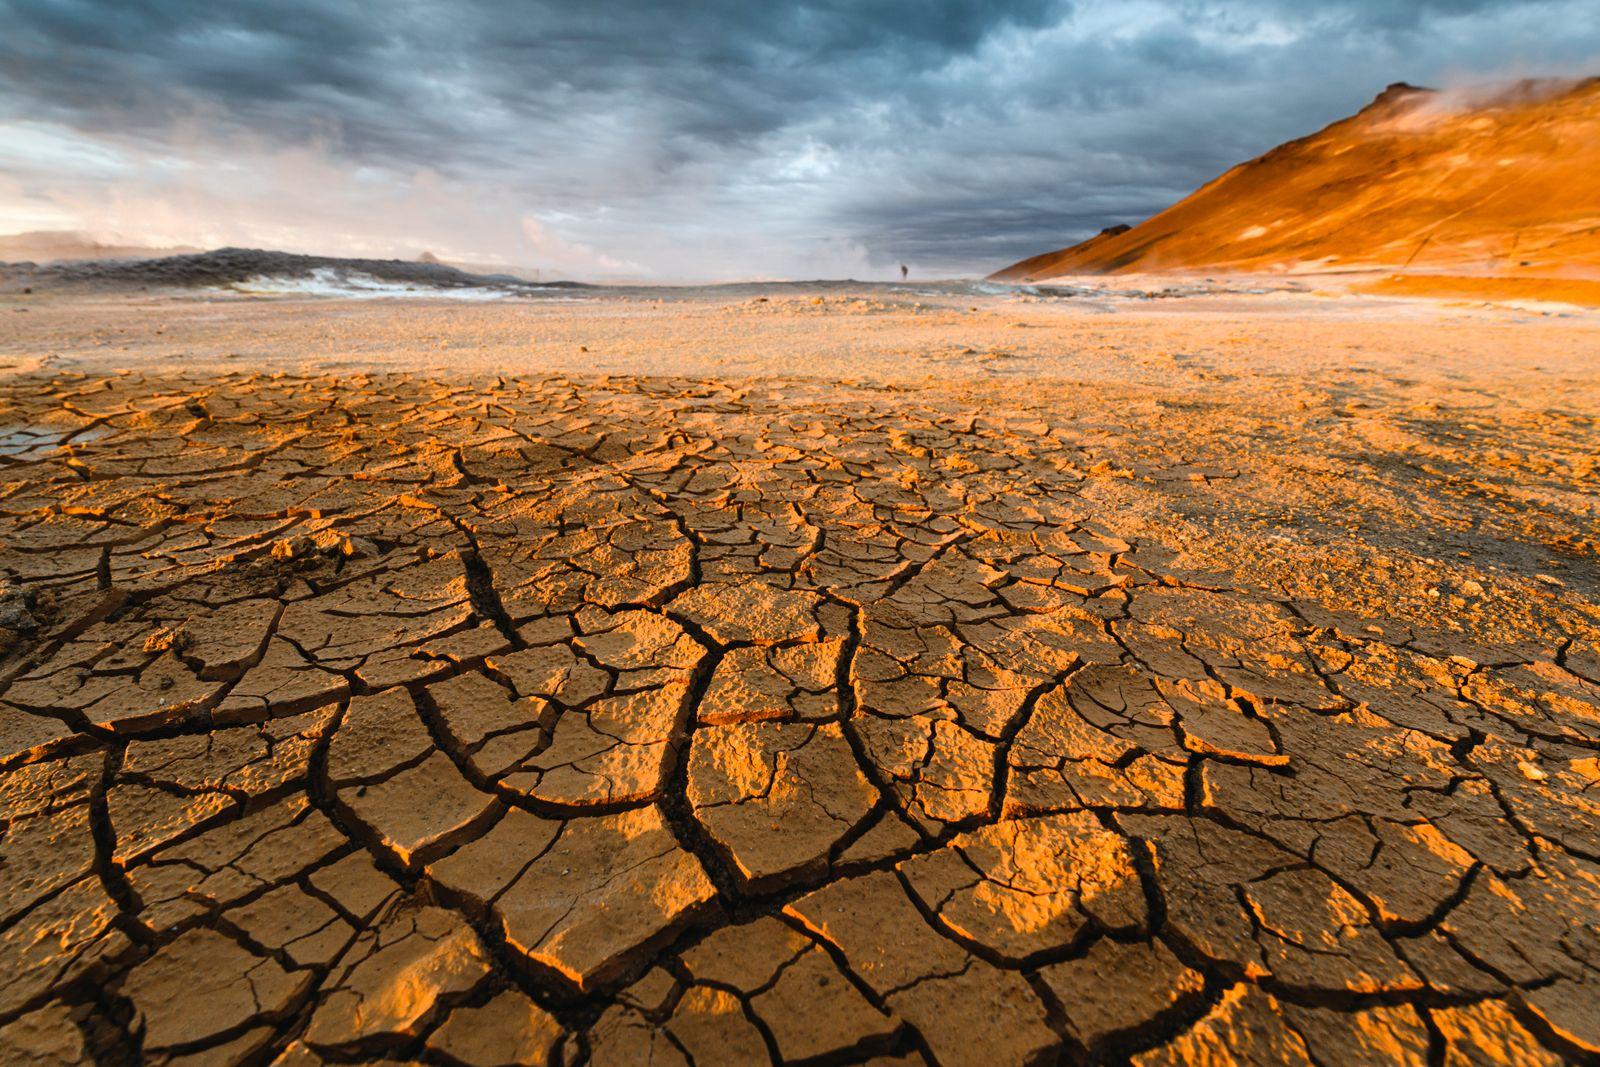 Textured cracked mud landscape, Iceland